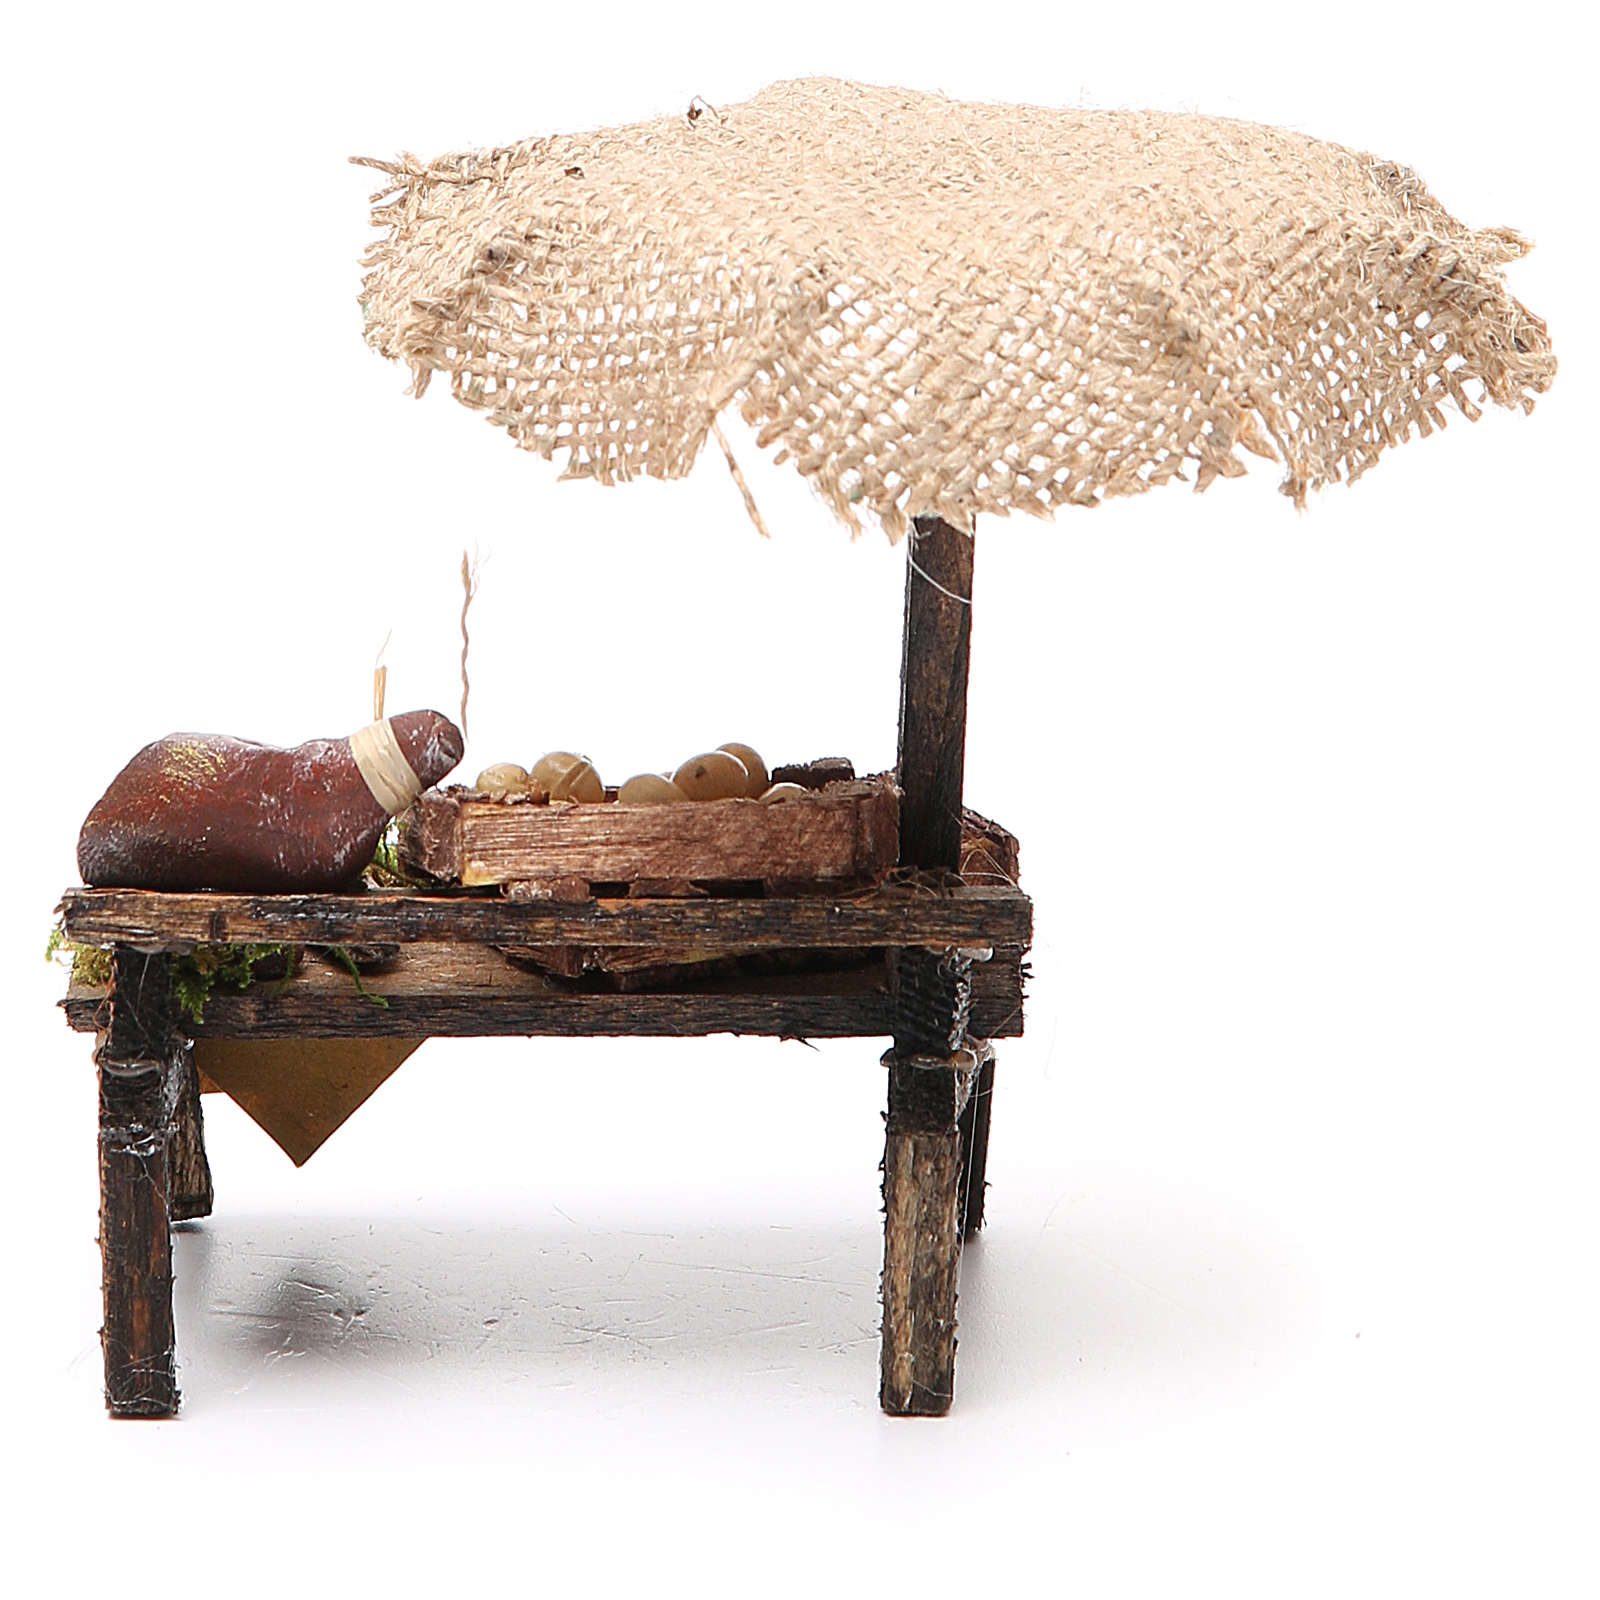 Mostrador embutidos huevos belén con paraguas 12x10x12 cm 4